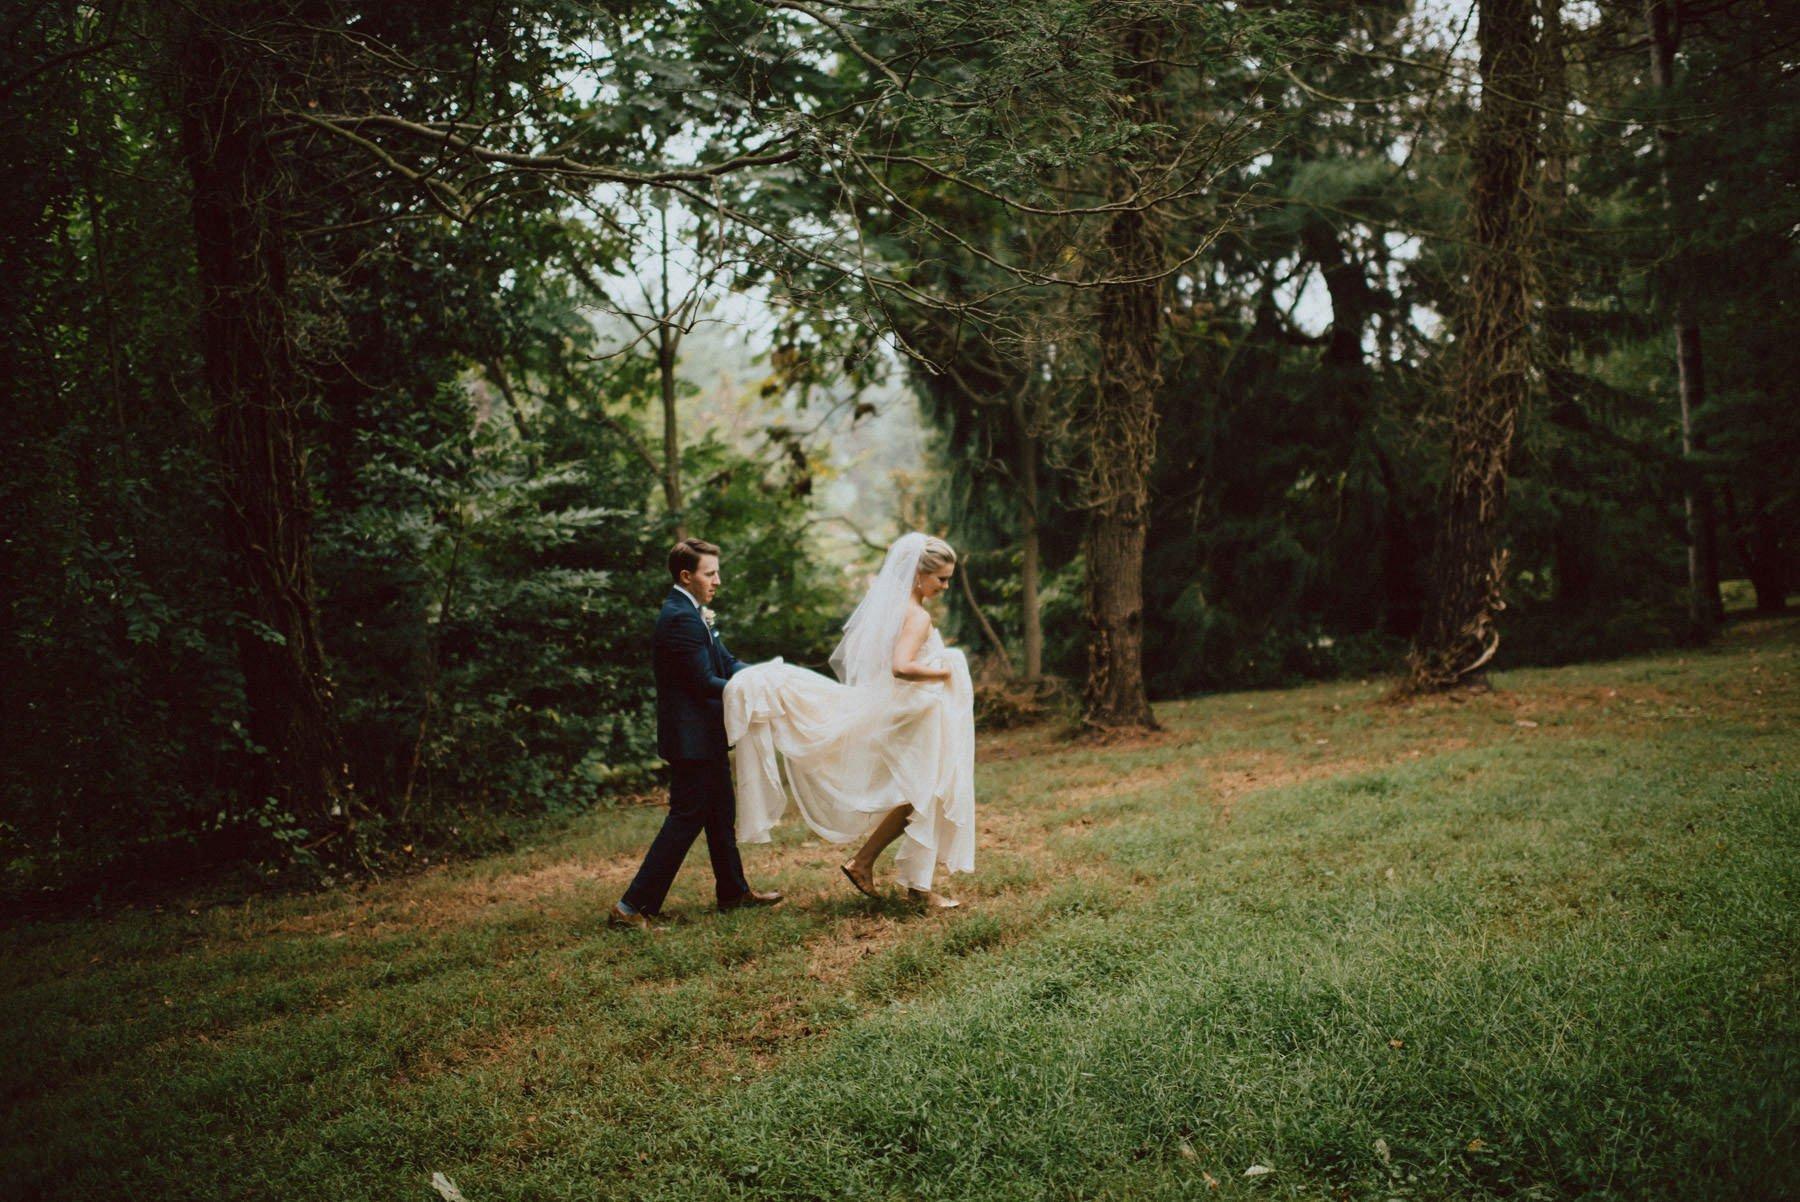 greenville-country-club-wedding-81.jpg